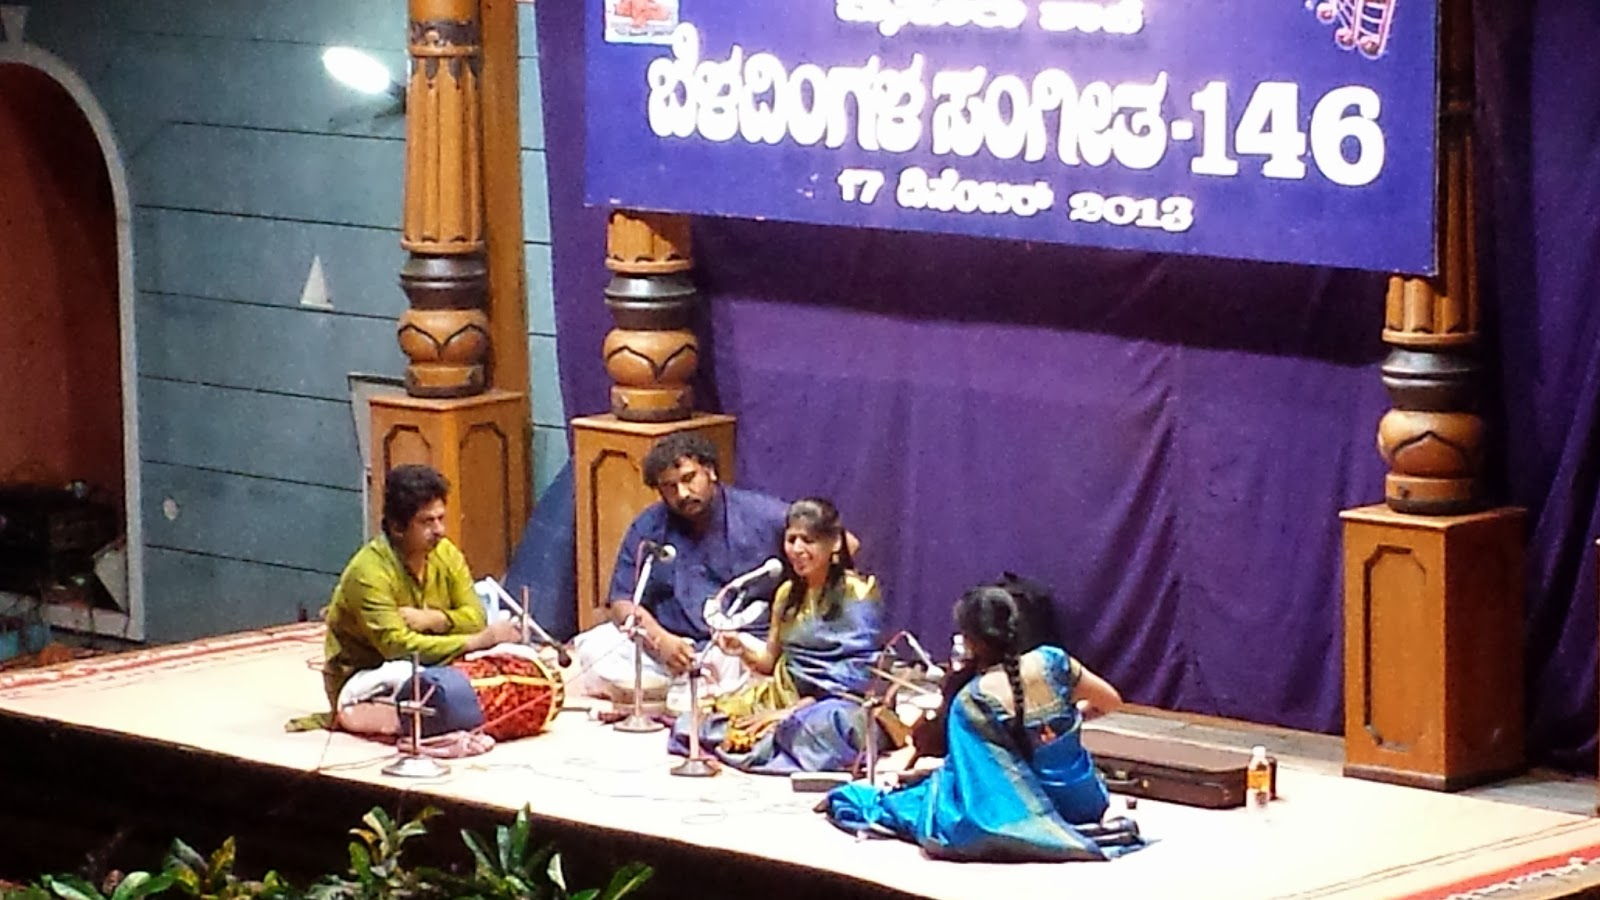 Kiranavali Suttur Matha concert - Dec 17, 2013